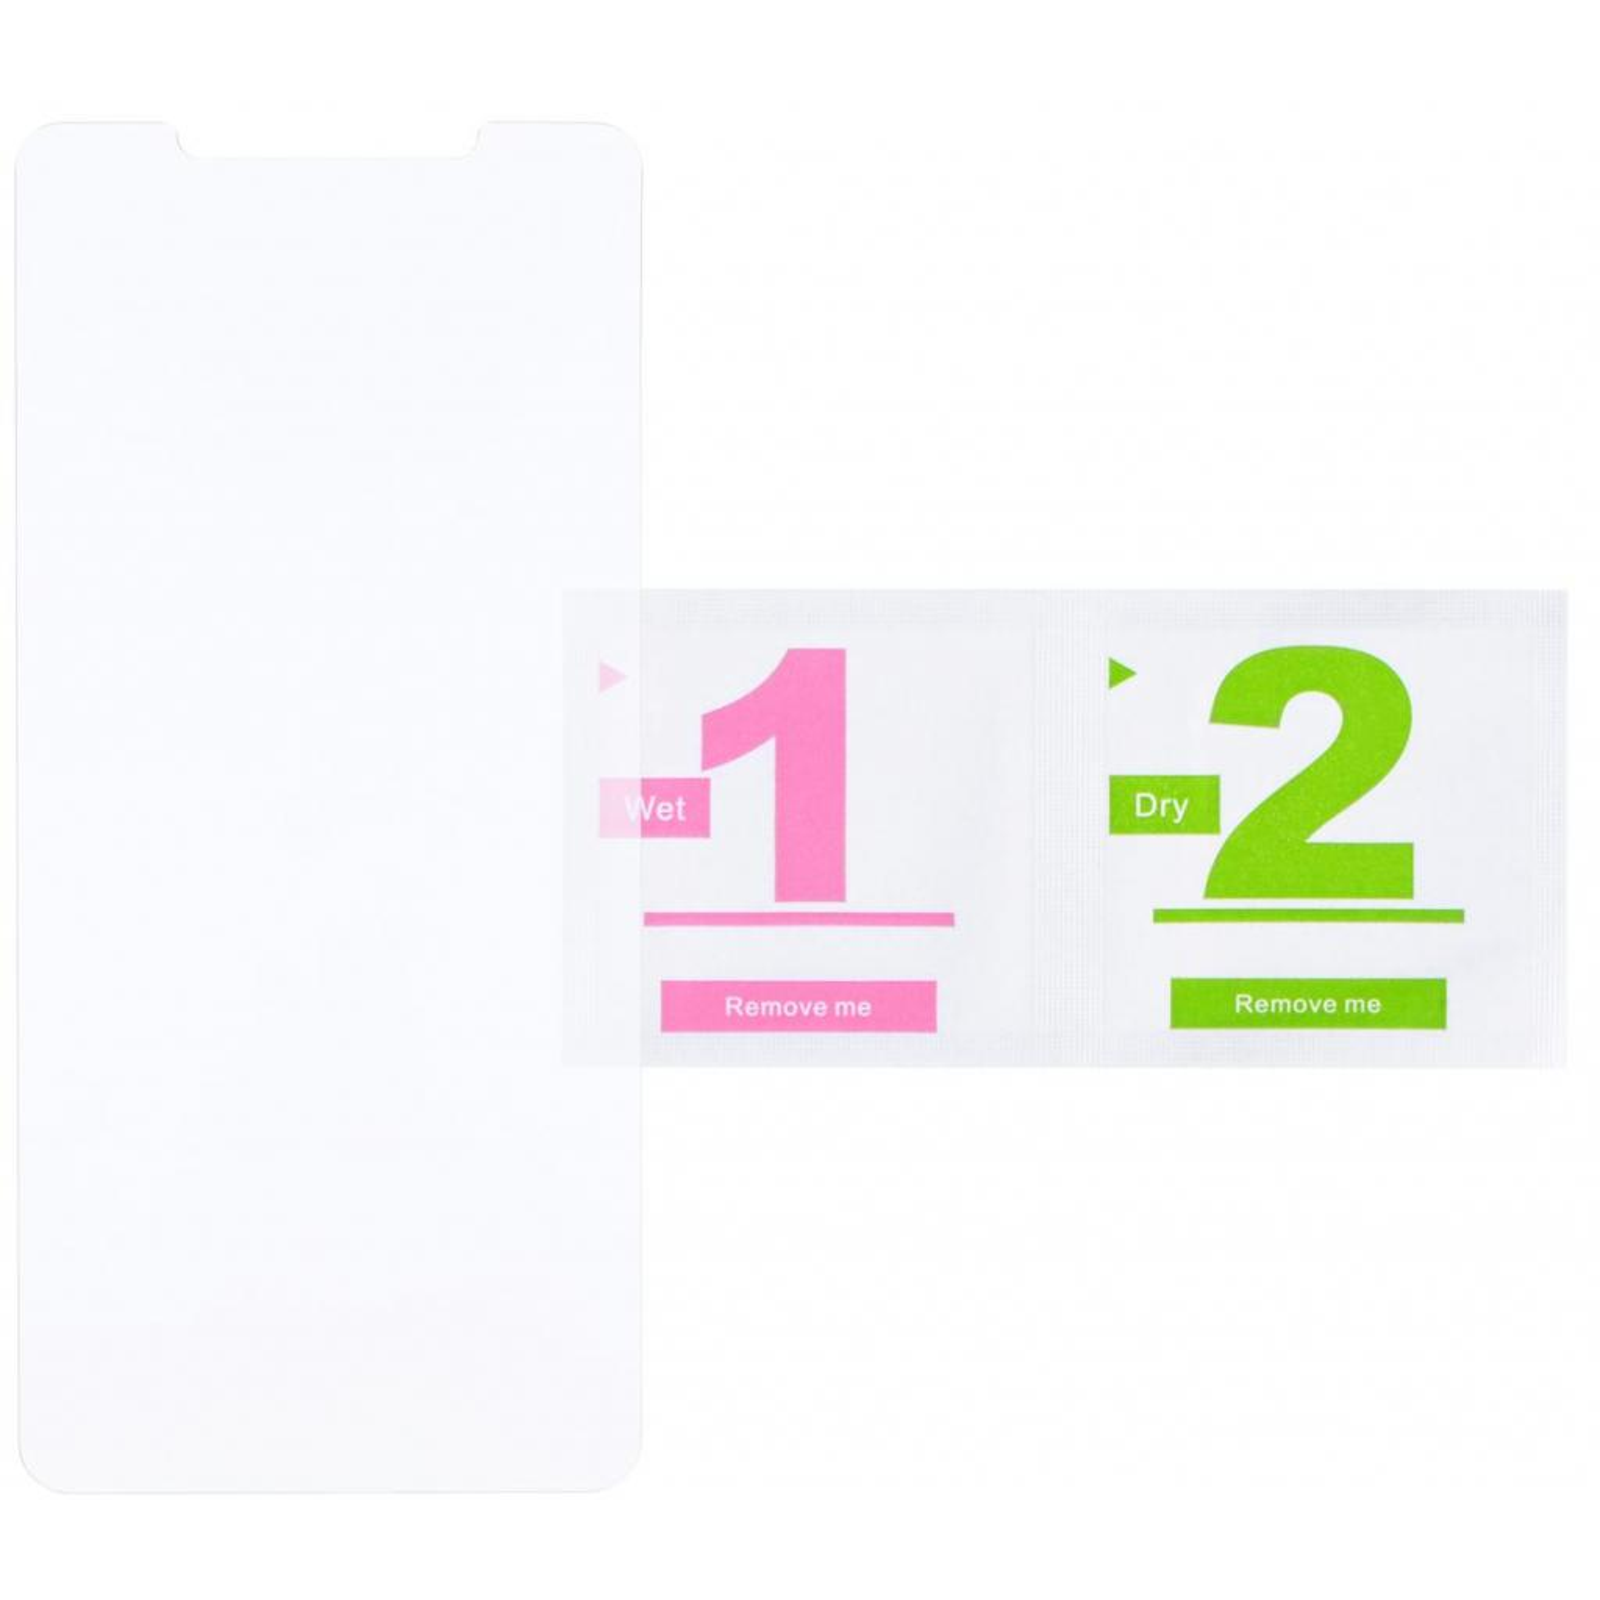 Стекло защитное 2E для Xiaomi Mi 8 2.5D Clear (2E-TGMI-MI8-25D) изображение 2